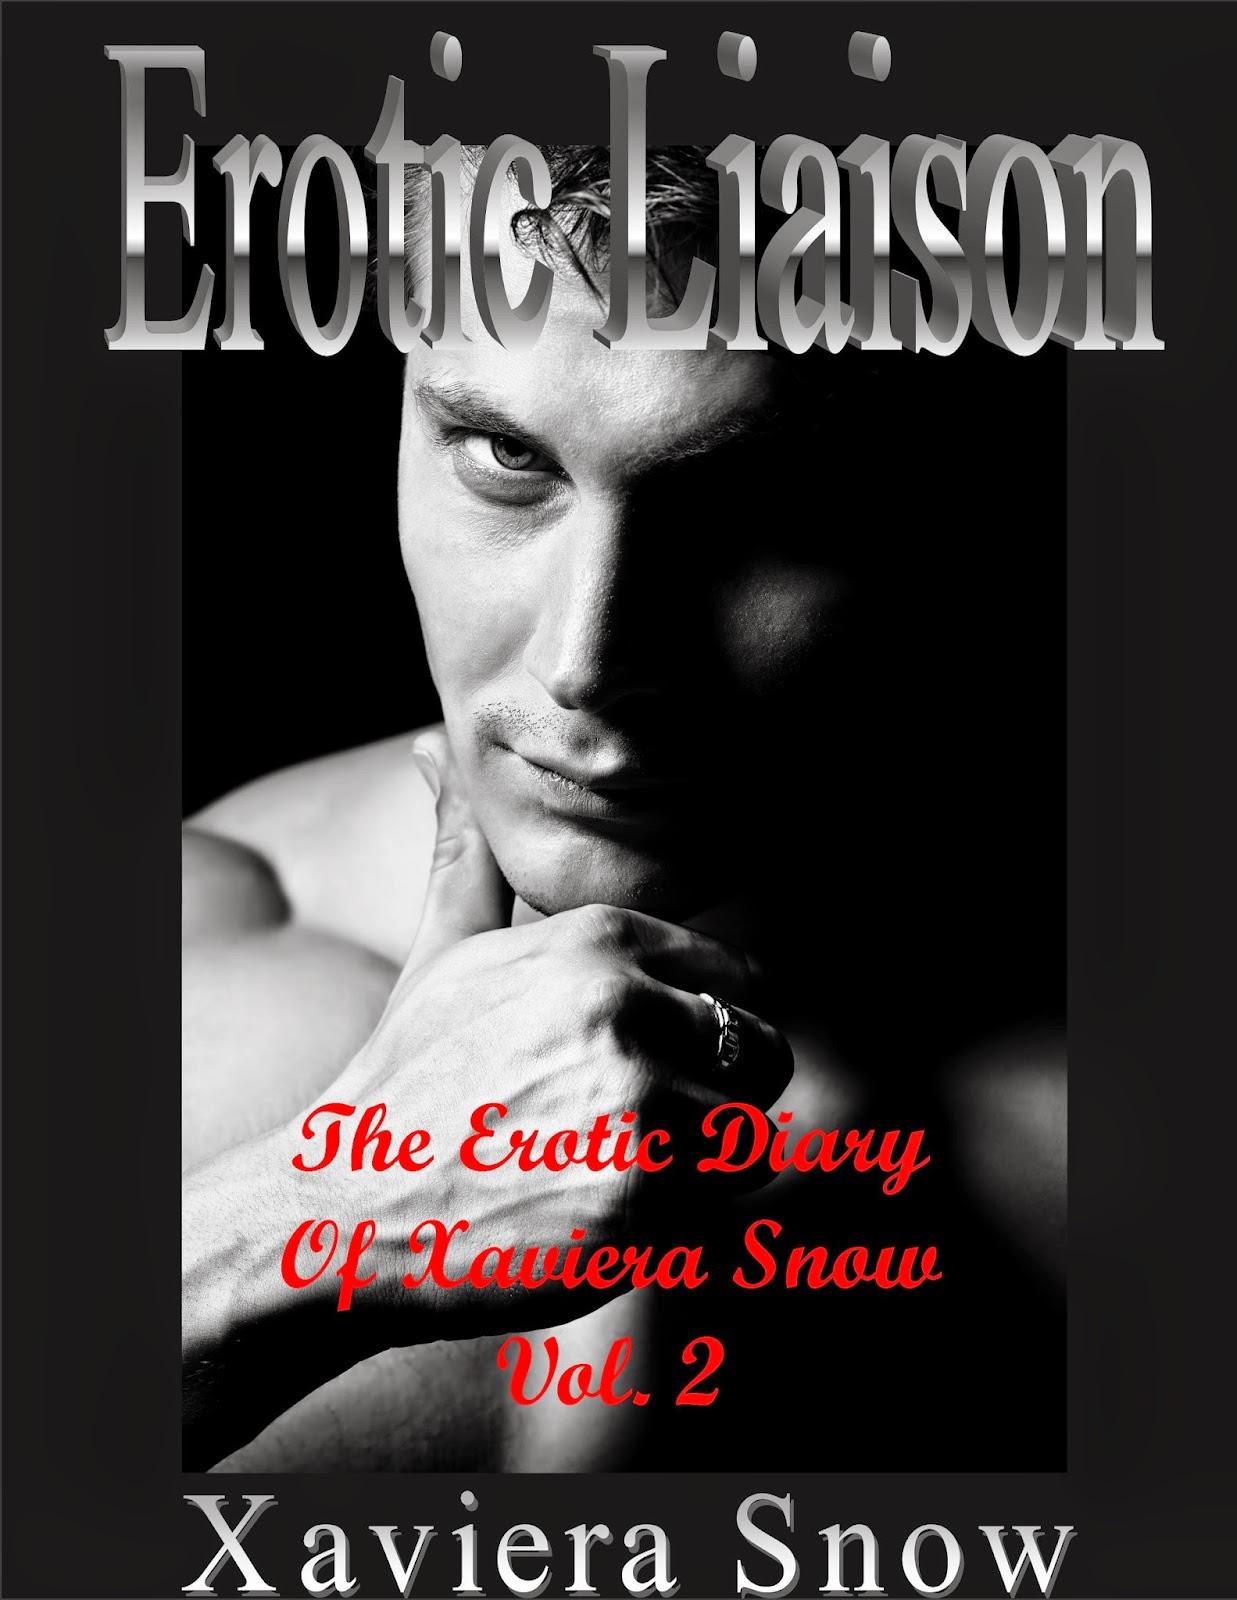 http://www.amazon.com/Erotic-Liaison-Diary-Xaviera-Snow-ebook/dp/B00MZACP6K/ref=sr_1_3?ie=UTF8&qid=1409908071&sr=8-3&keywords=MICHELE+GWYNN